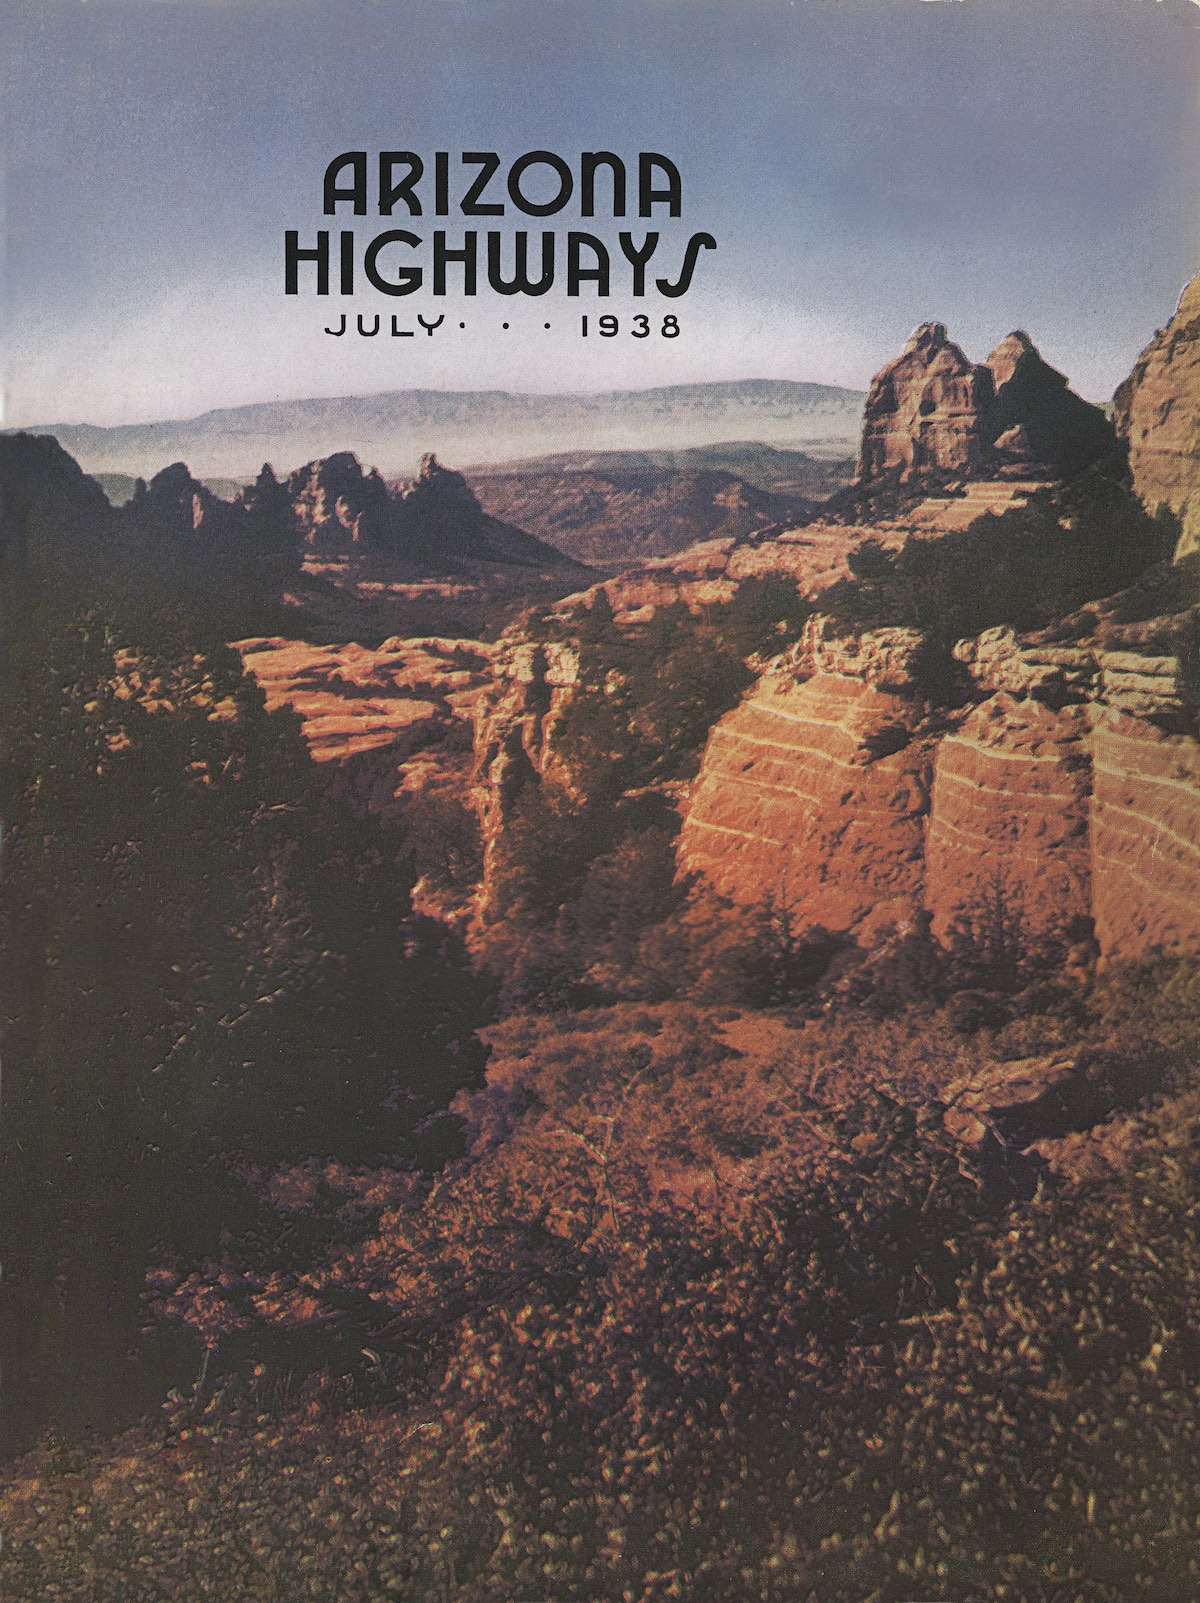 July 1938 cover of Arizona Highways